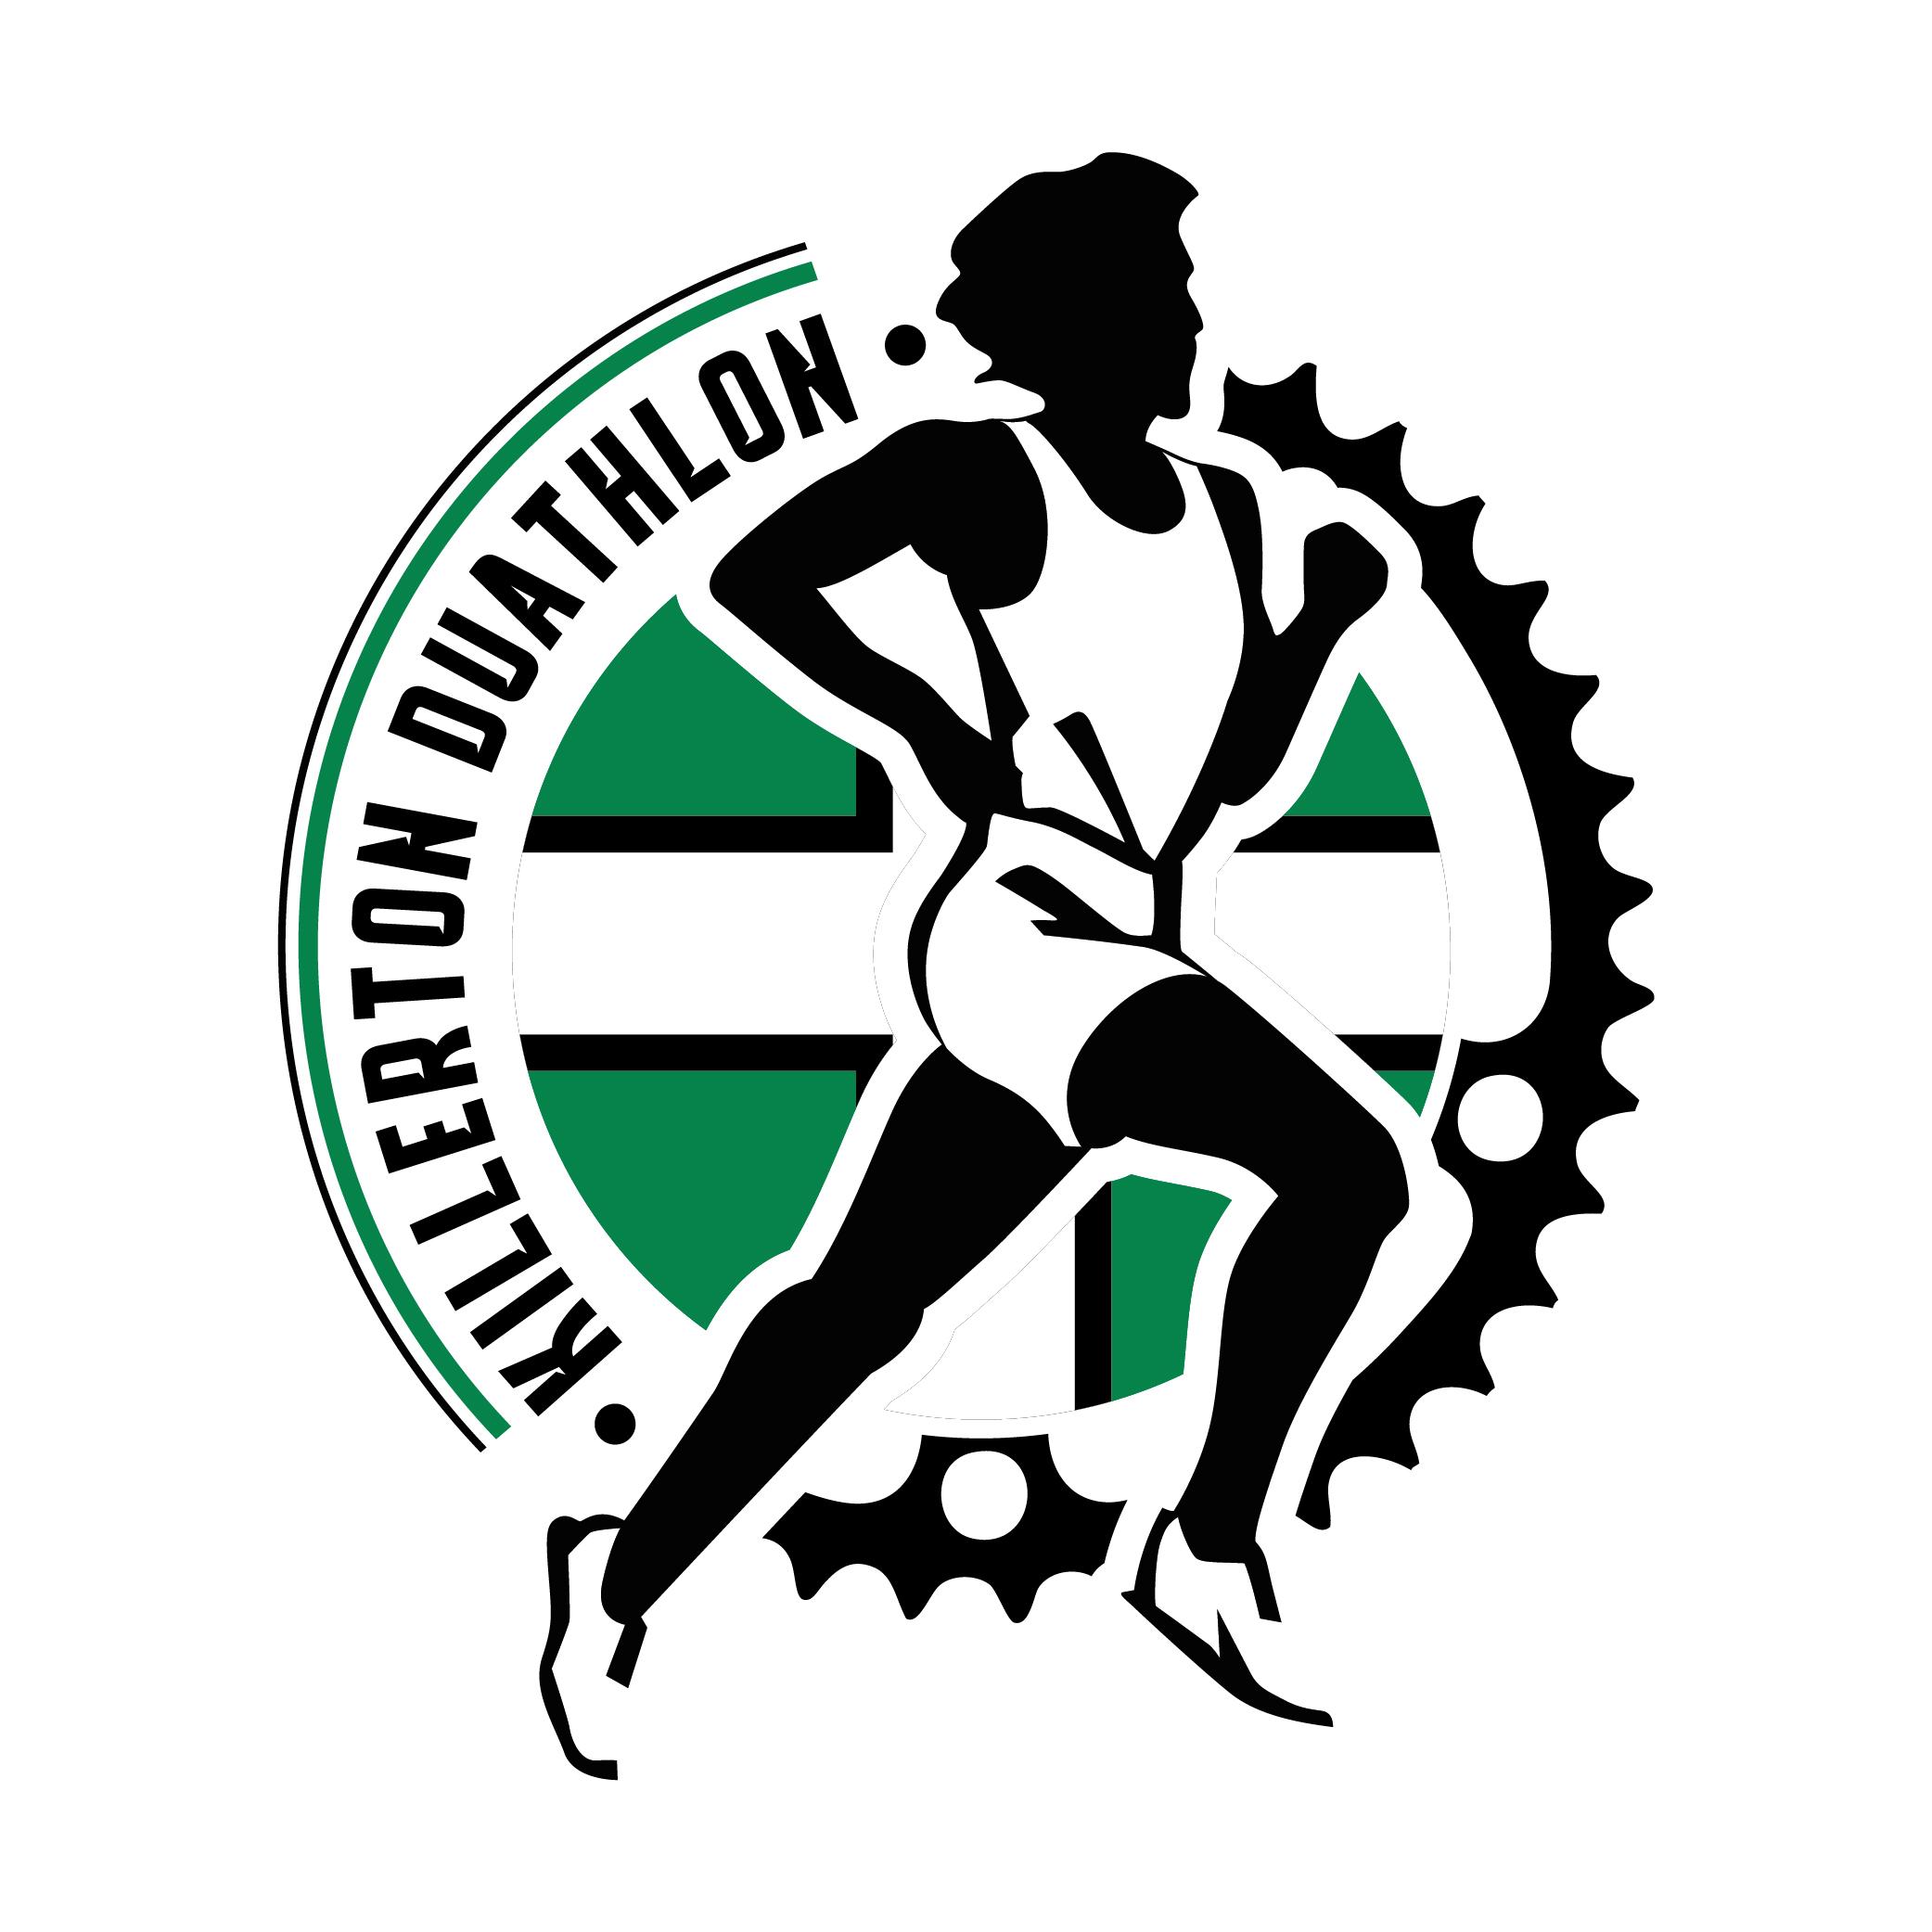 Killerton Sprint Duathlon - cover image